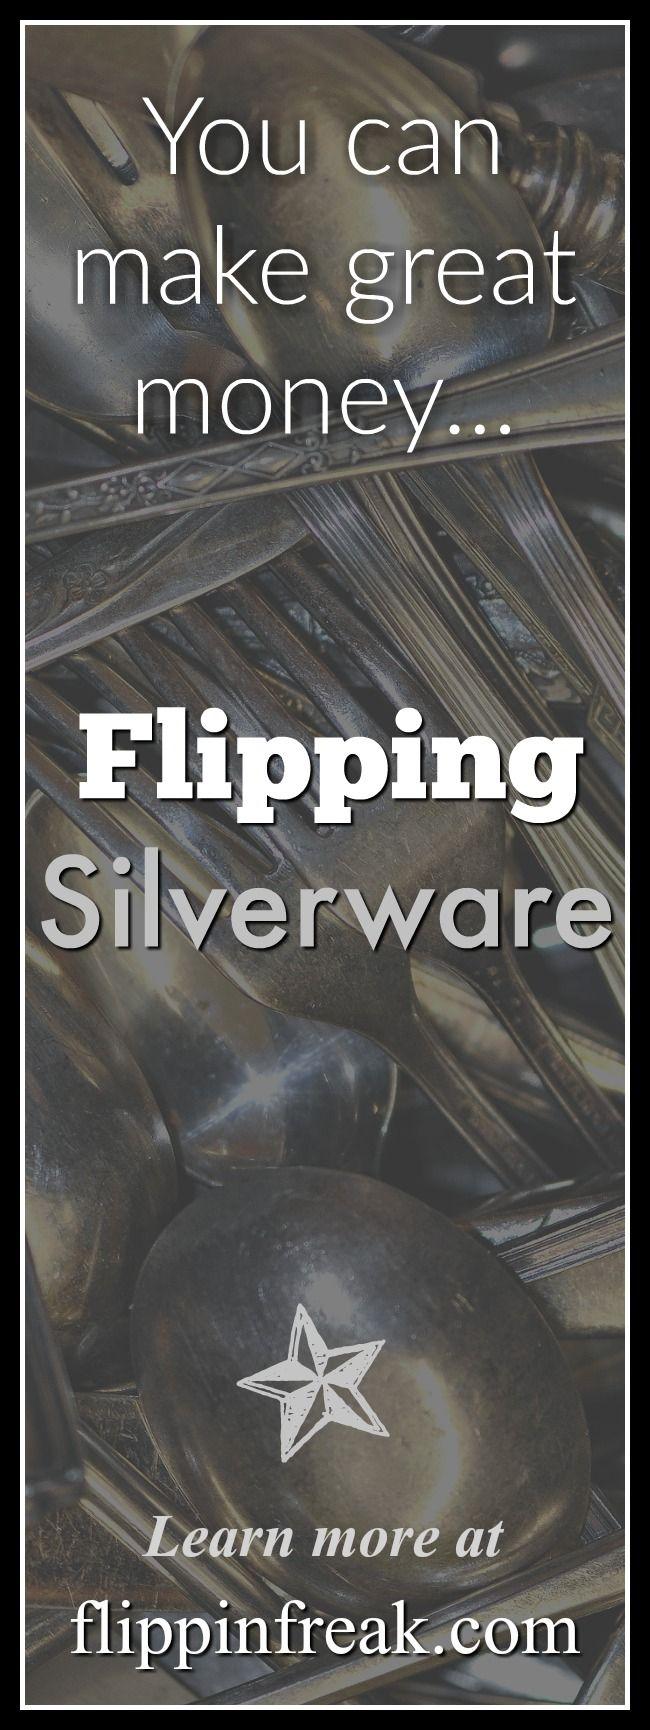 Learn how to make great money flipping Silverware! @flippinfreak.com #sterlingsilver #sterling #silver #collectibles #flipping #fllippinfreak